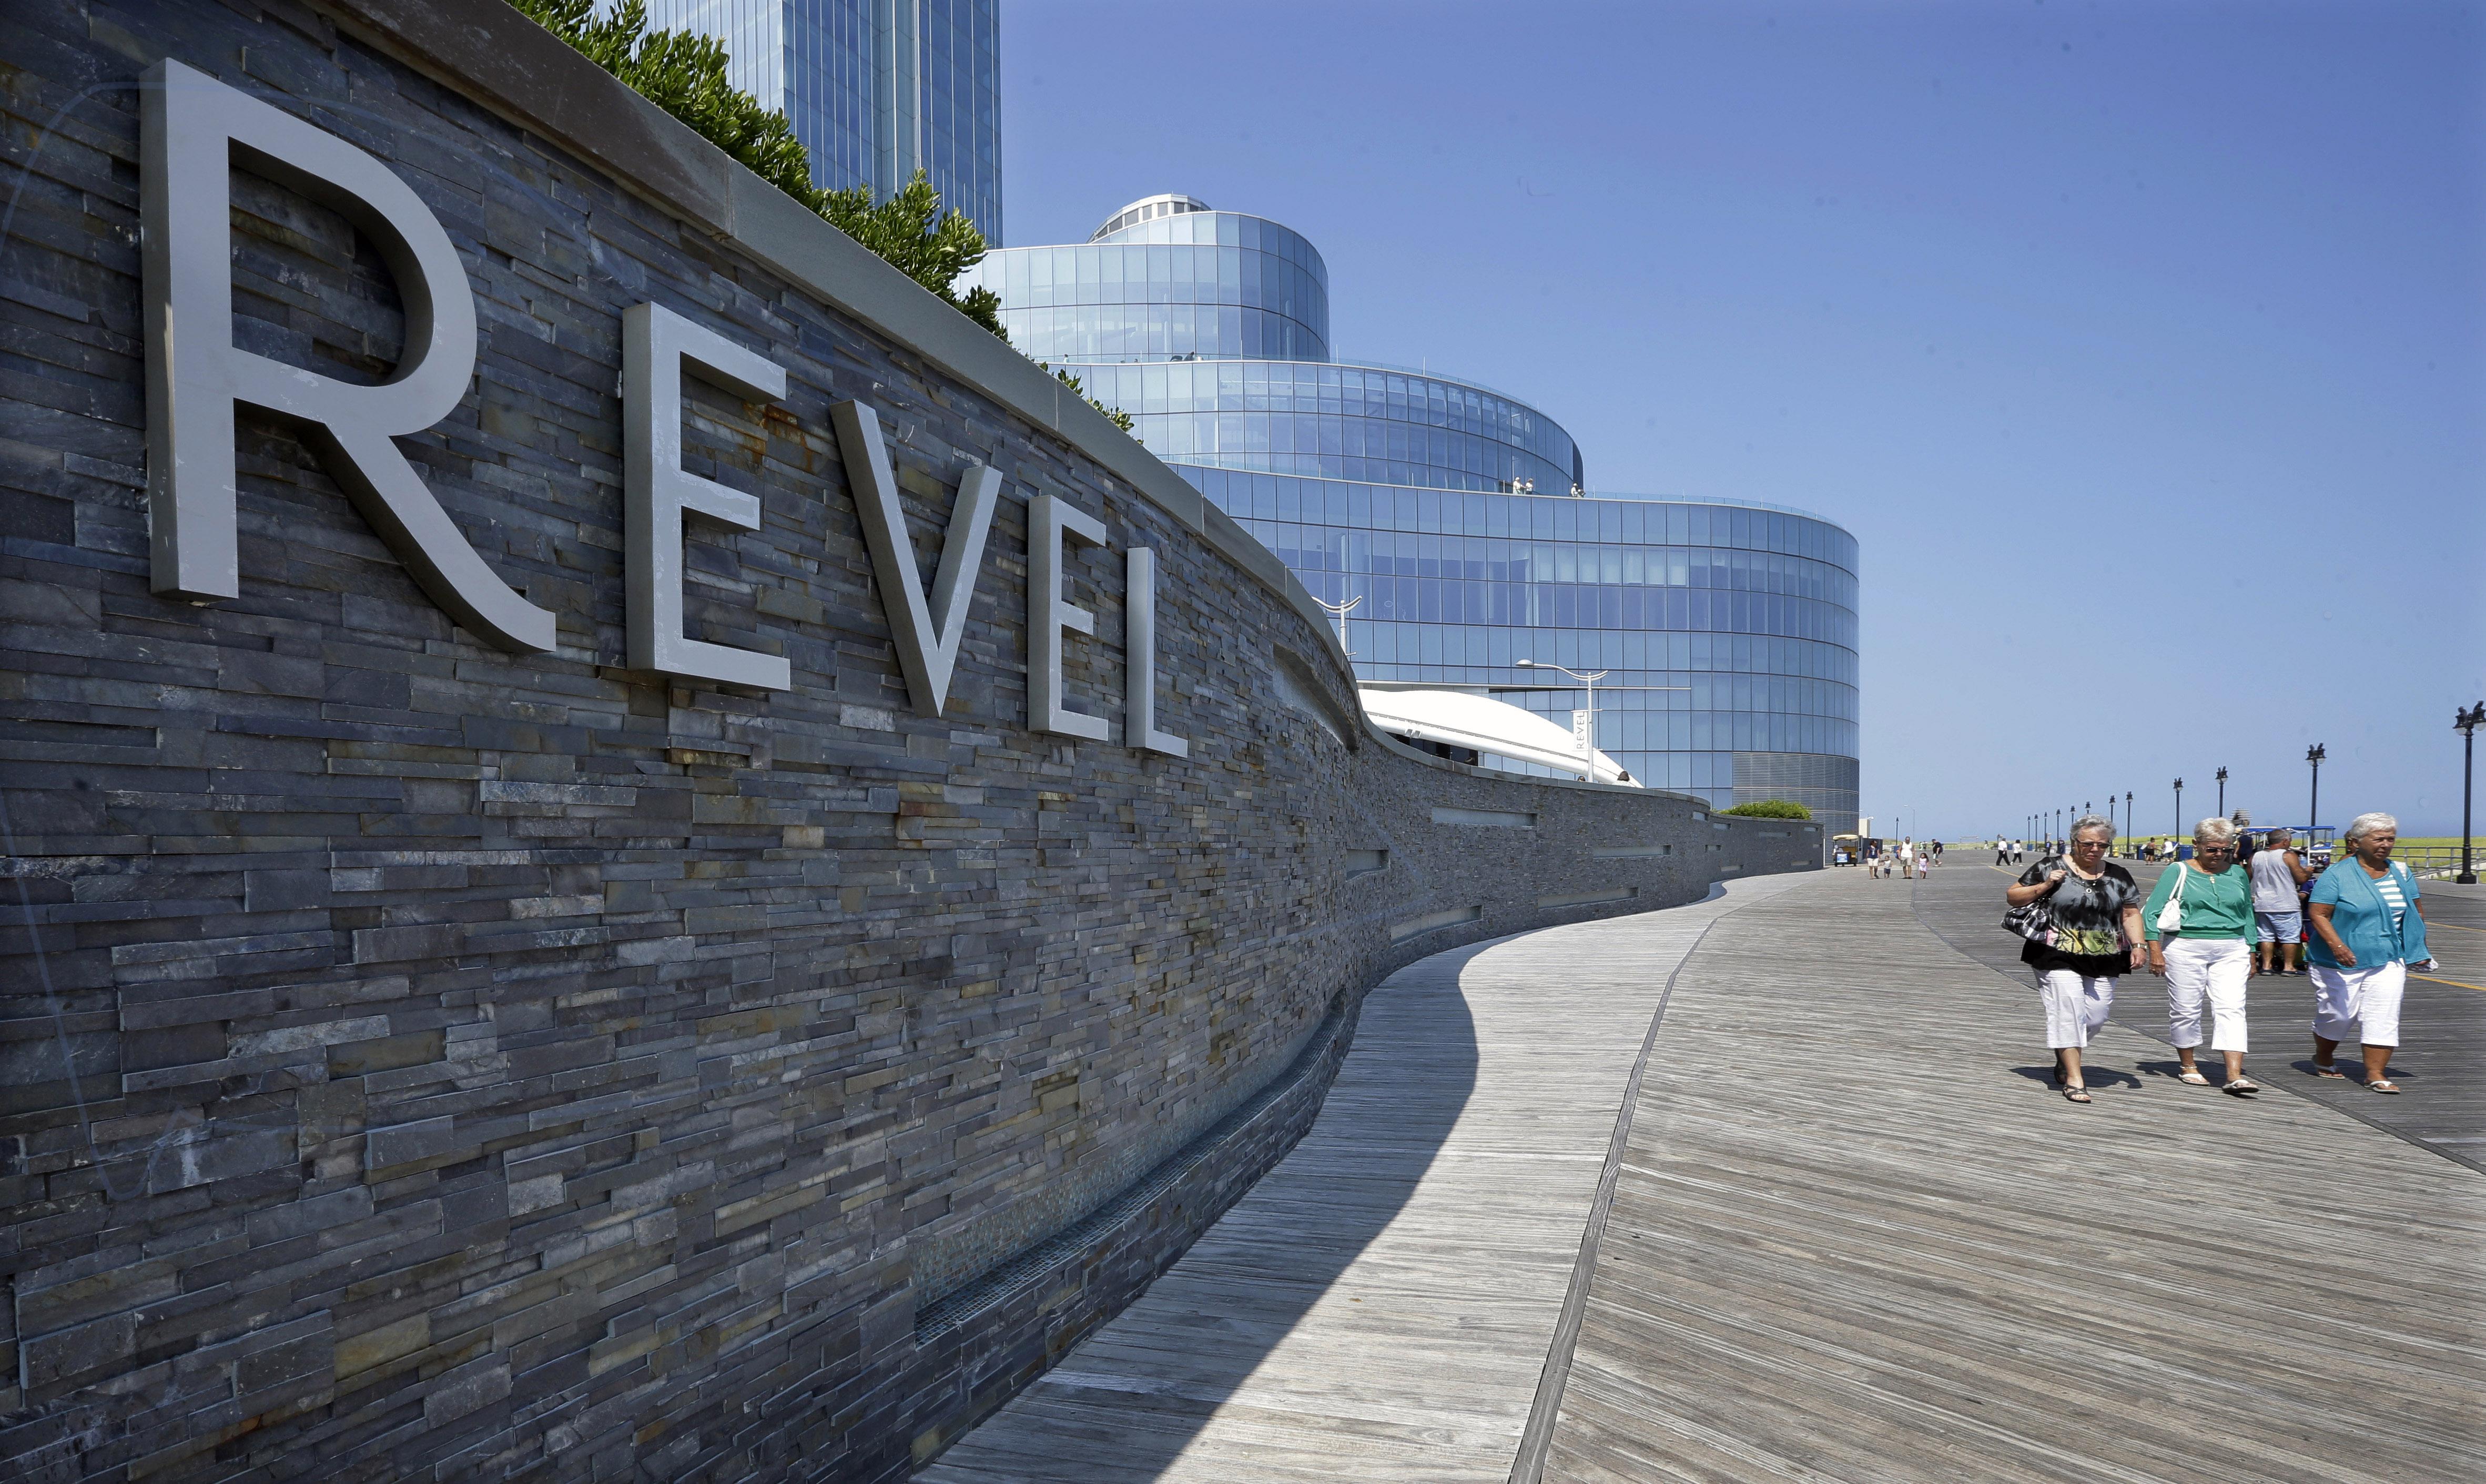 People walk past the Revel Casino Hotel in Atlantic City, N.J. on July 23, 2014.